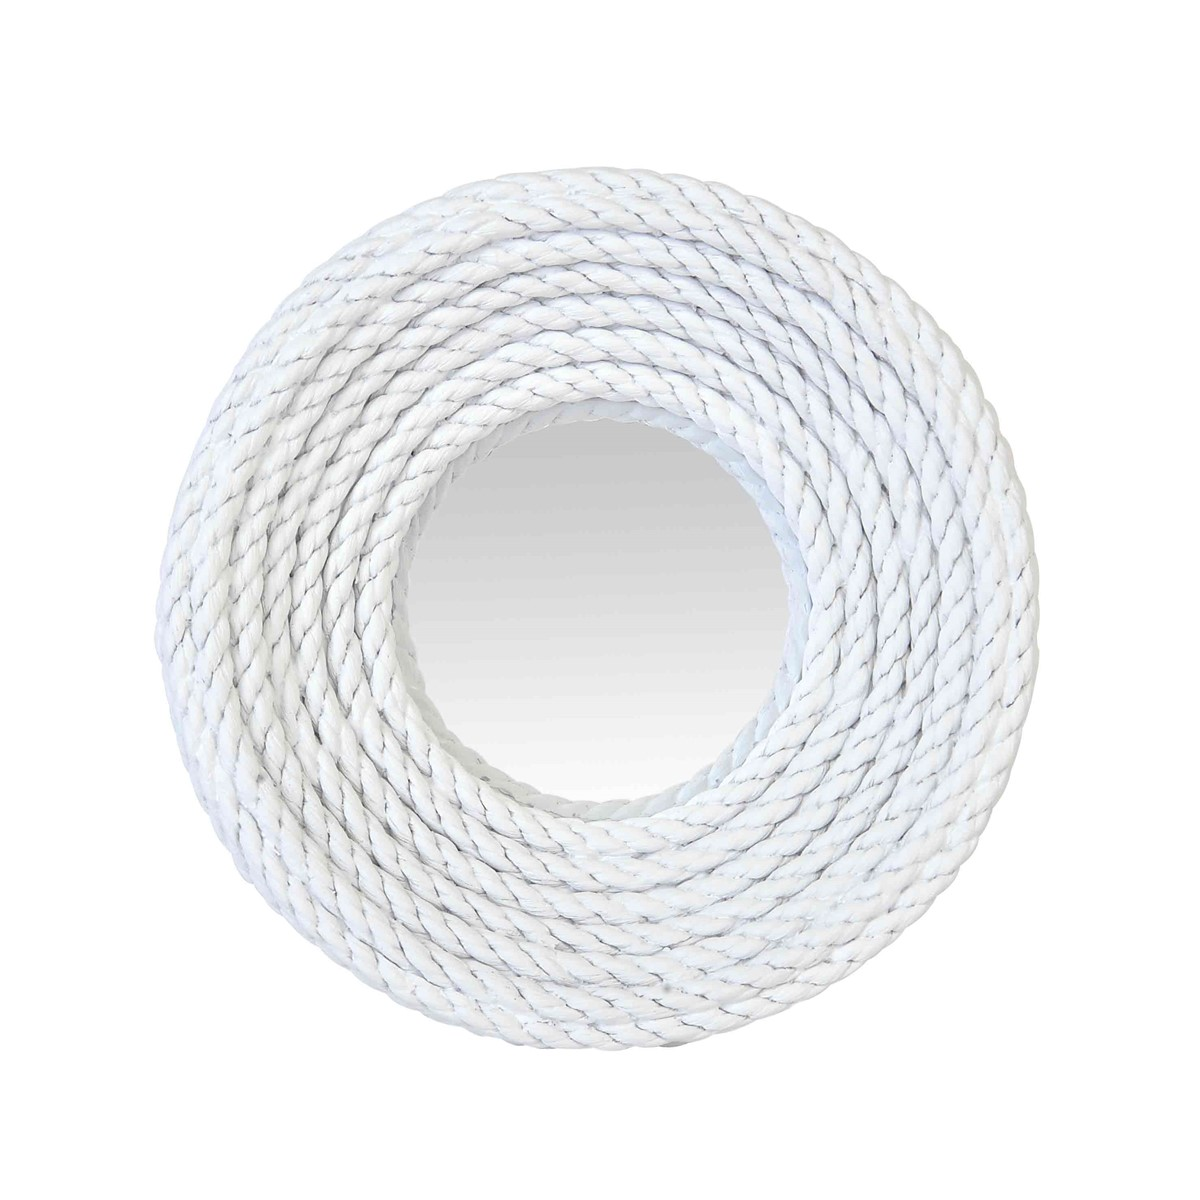 Miroir convexe corde blanche en résine D28